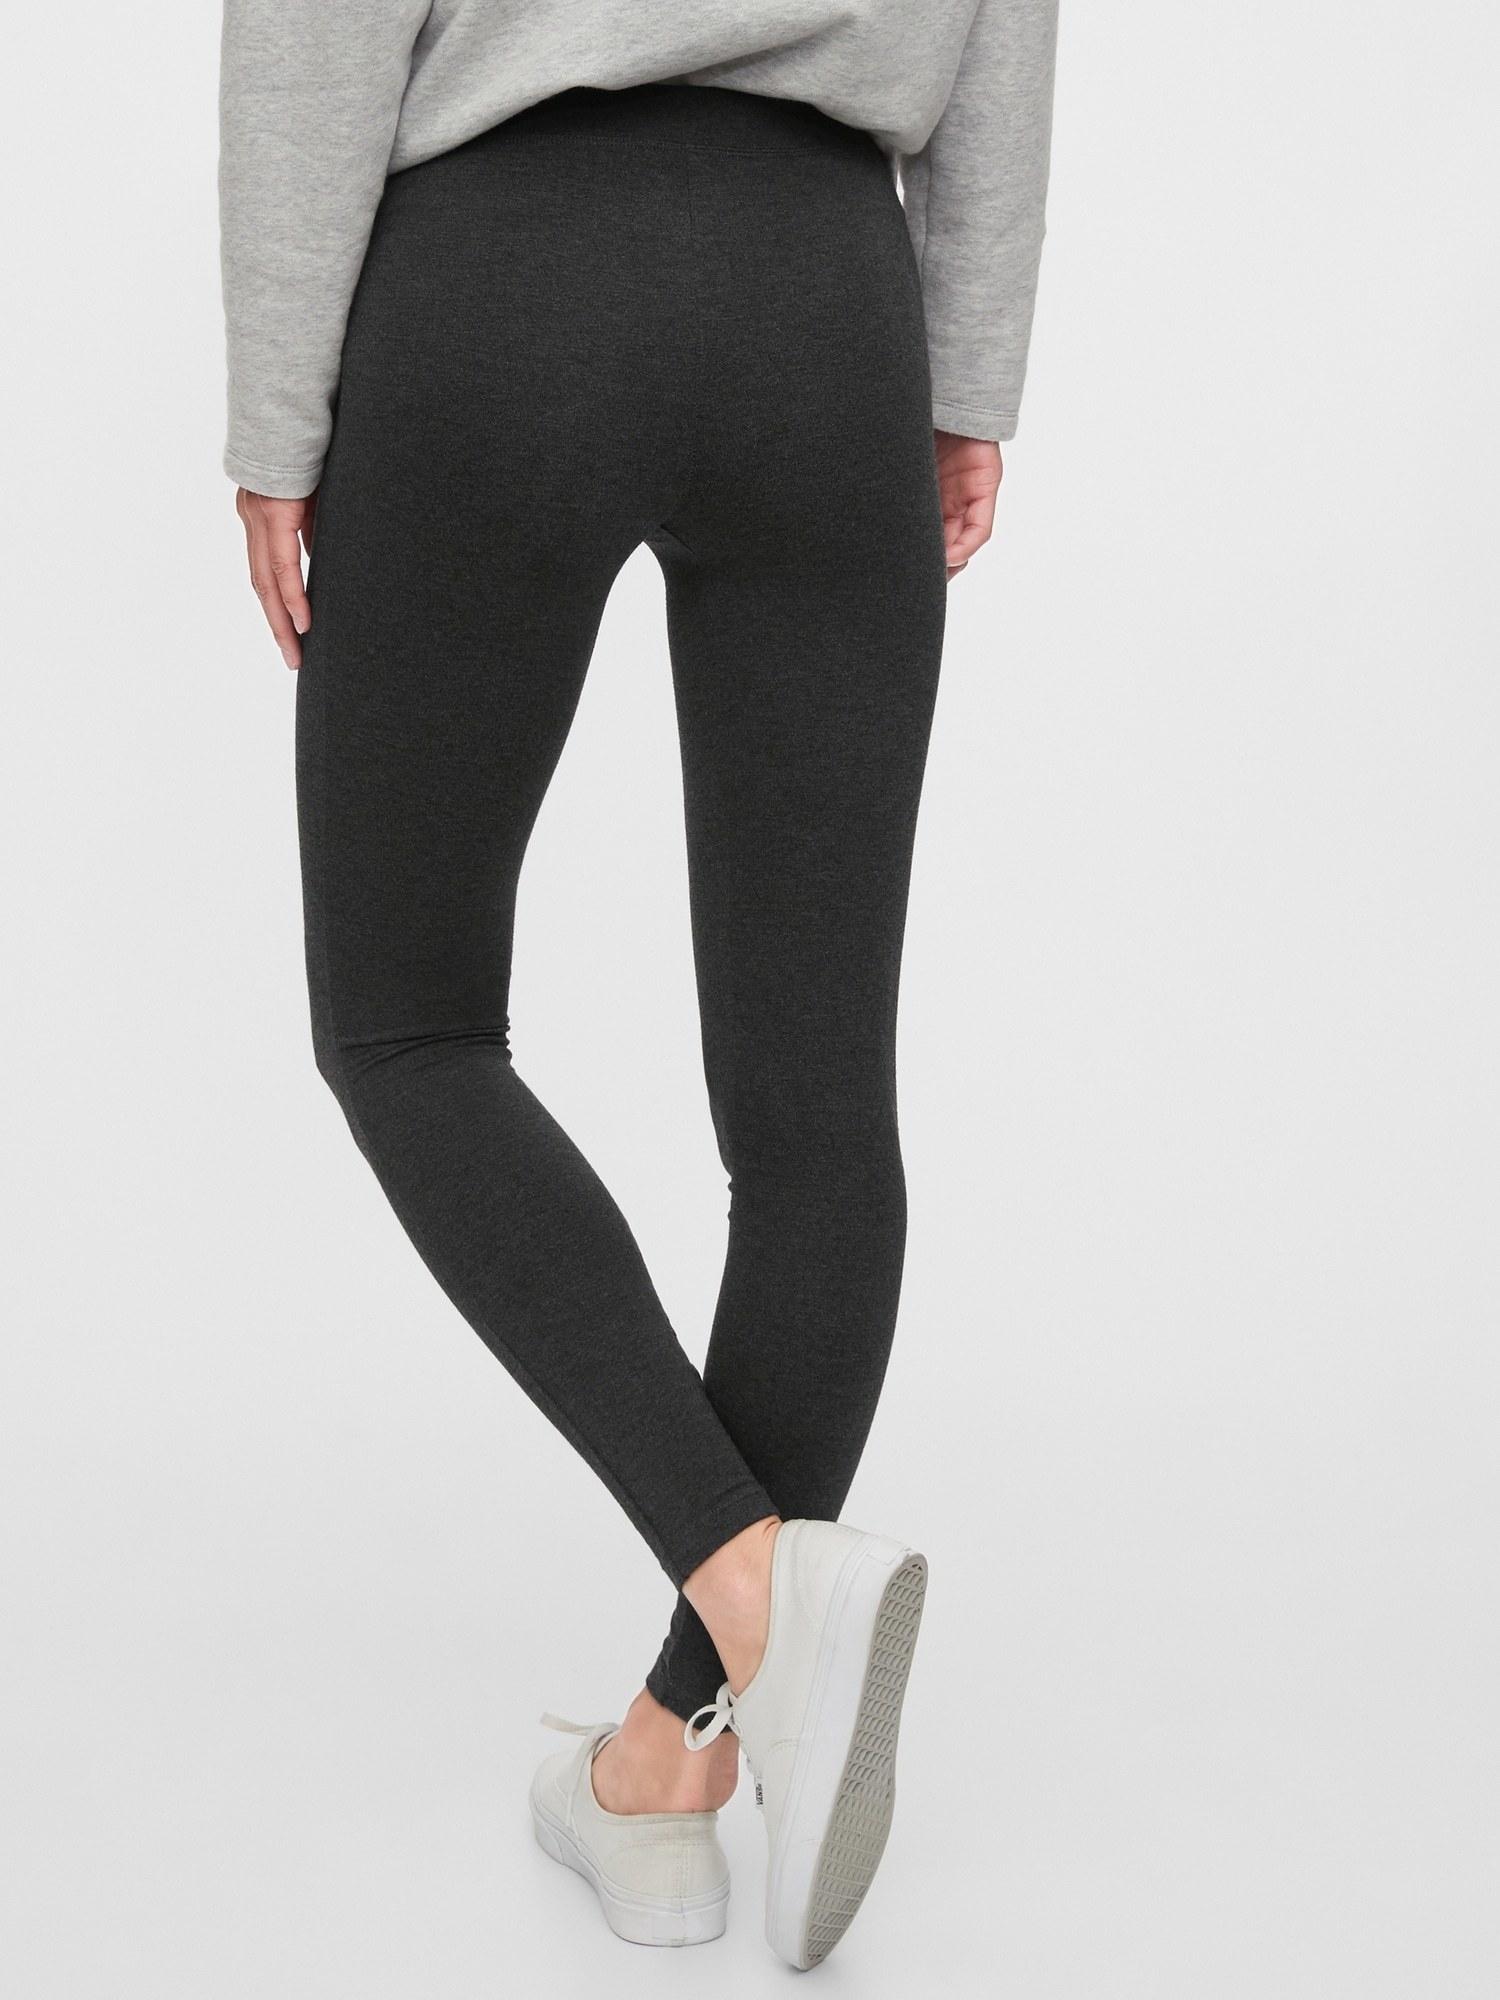 The leggings in charcoal grey